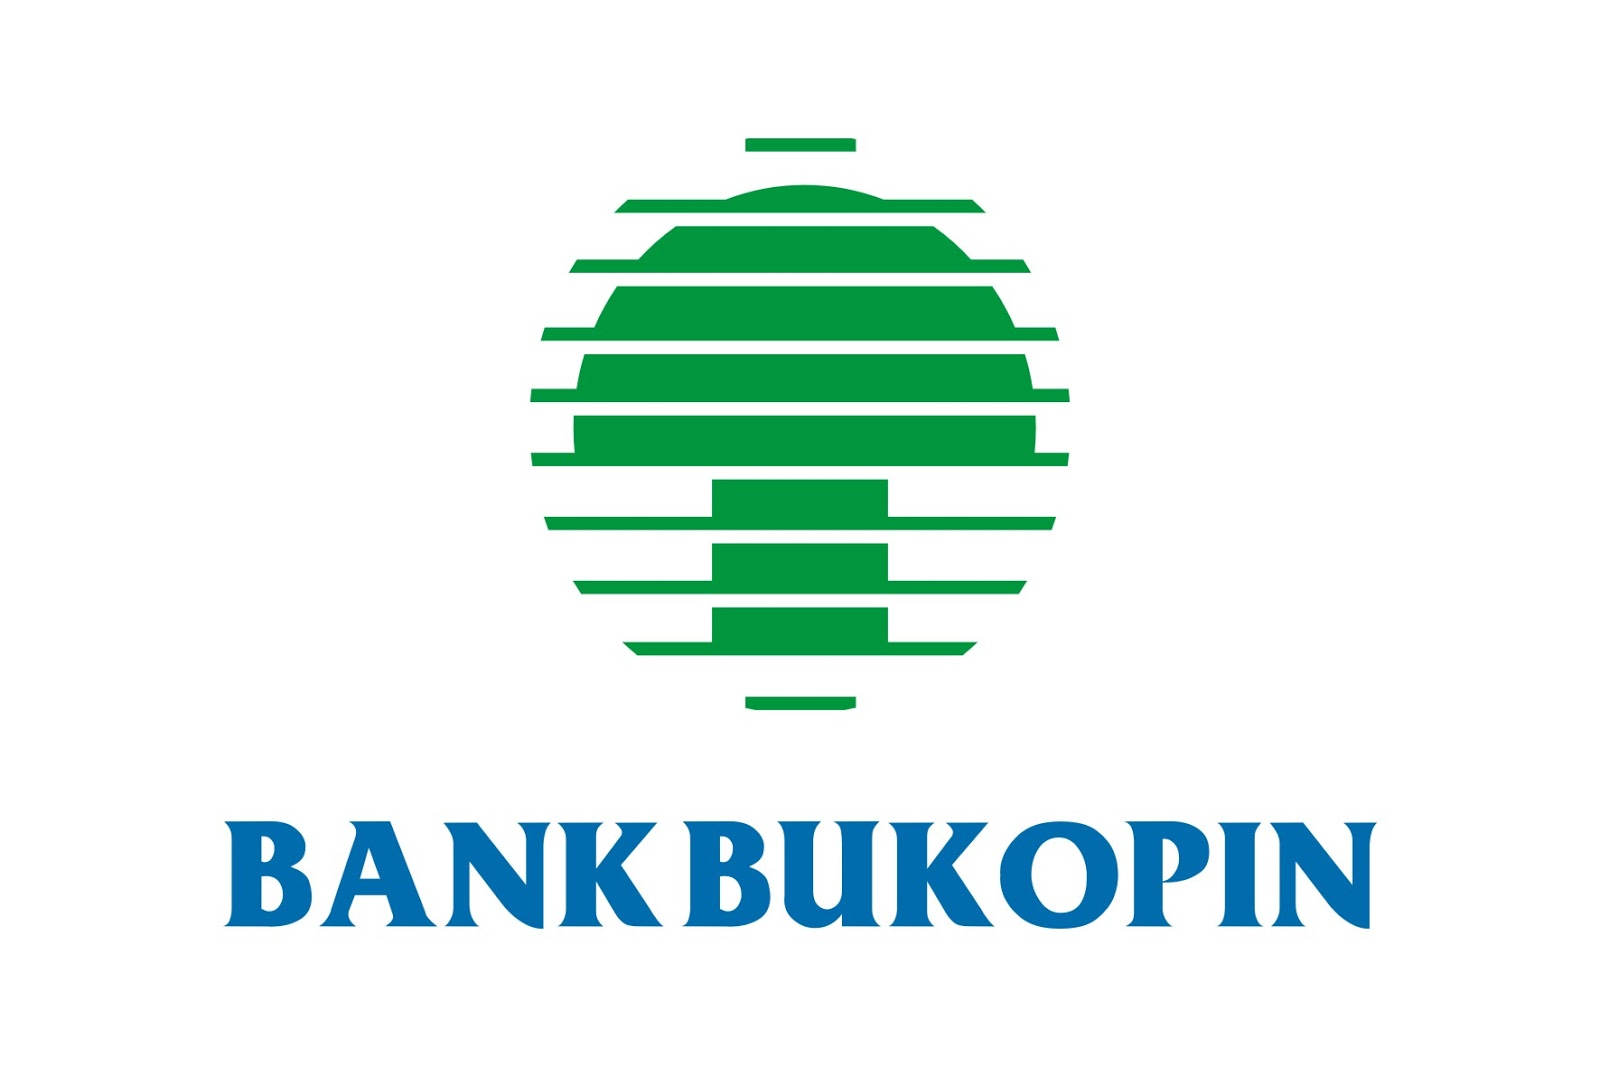 Bank Bukopin Logo photo - 1